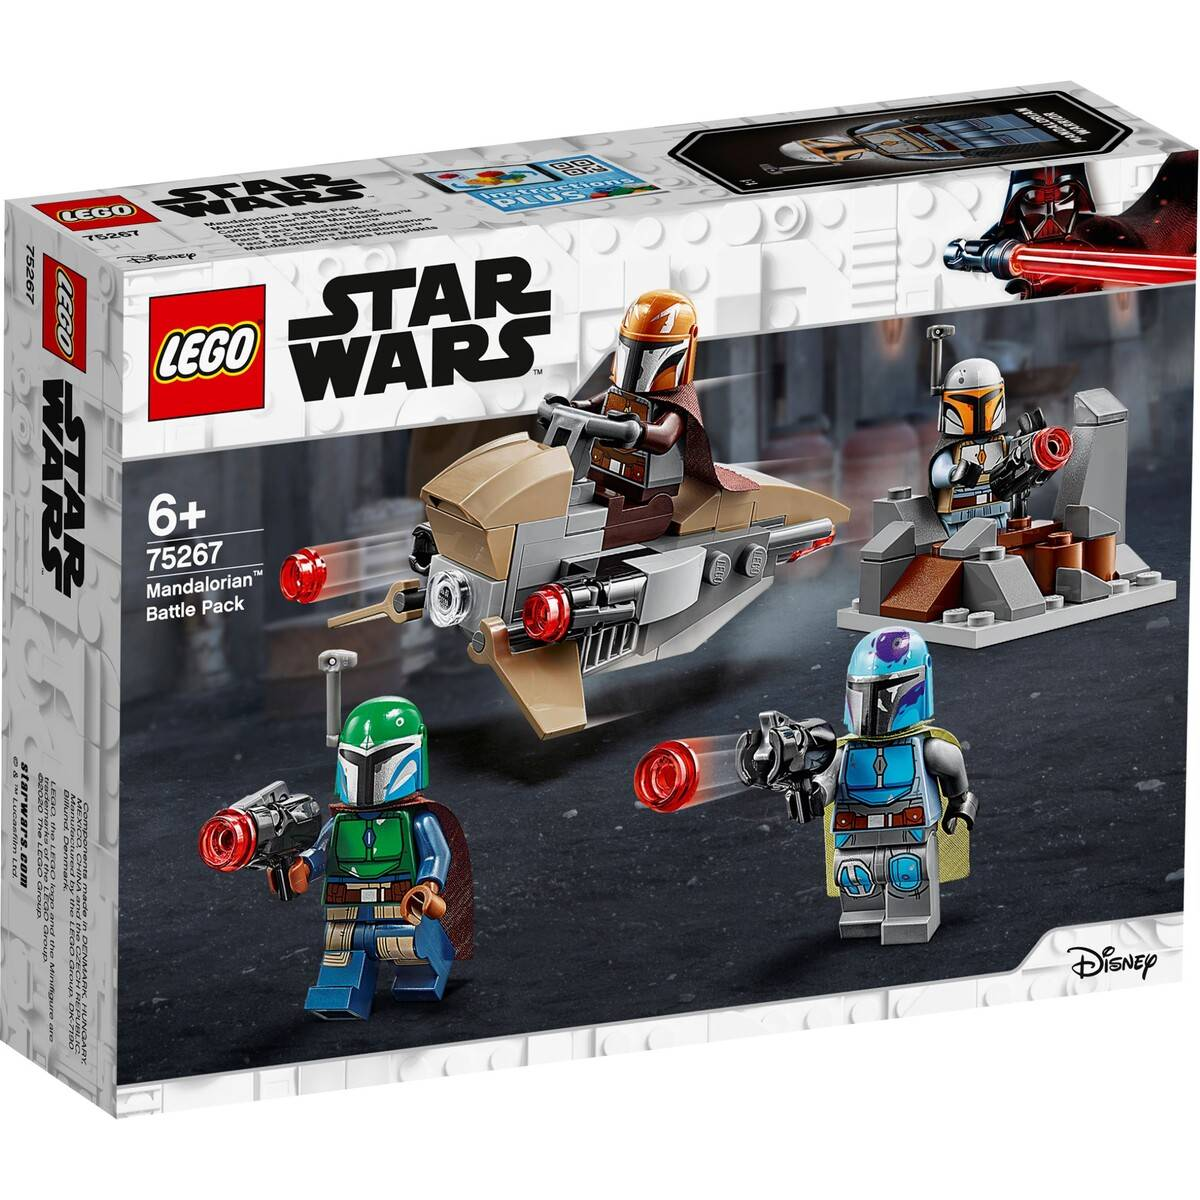 LEGO Star Wars Mandalorian battle